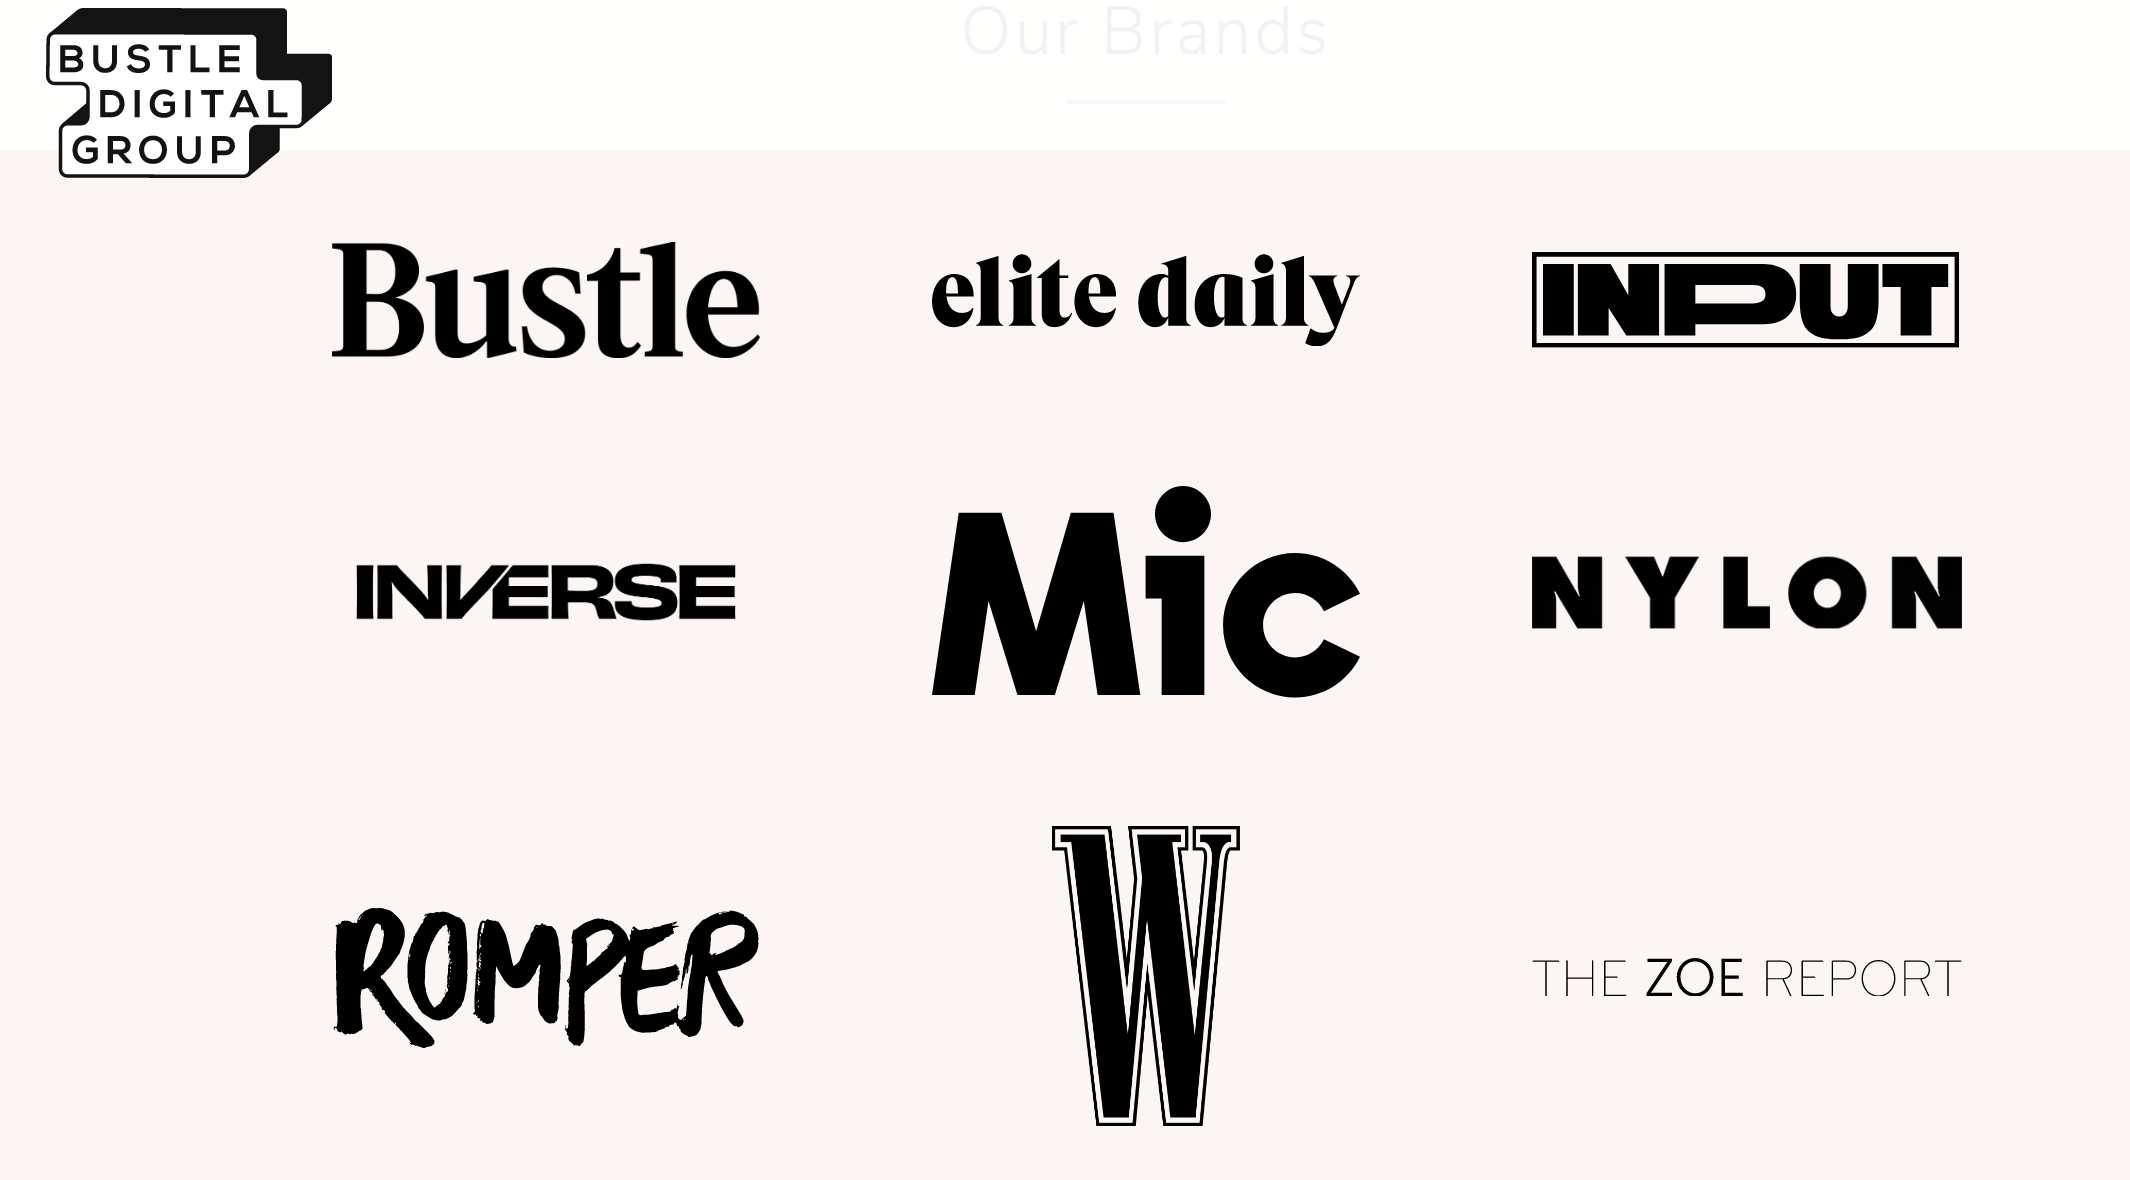 Bustle Digital Group's brands.